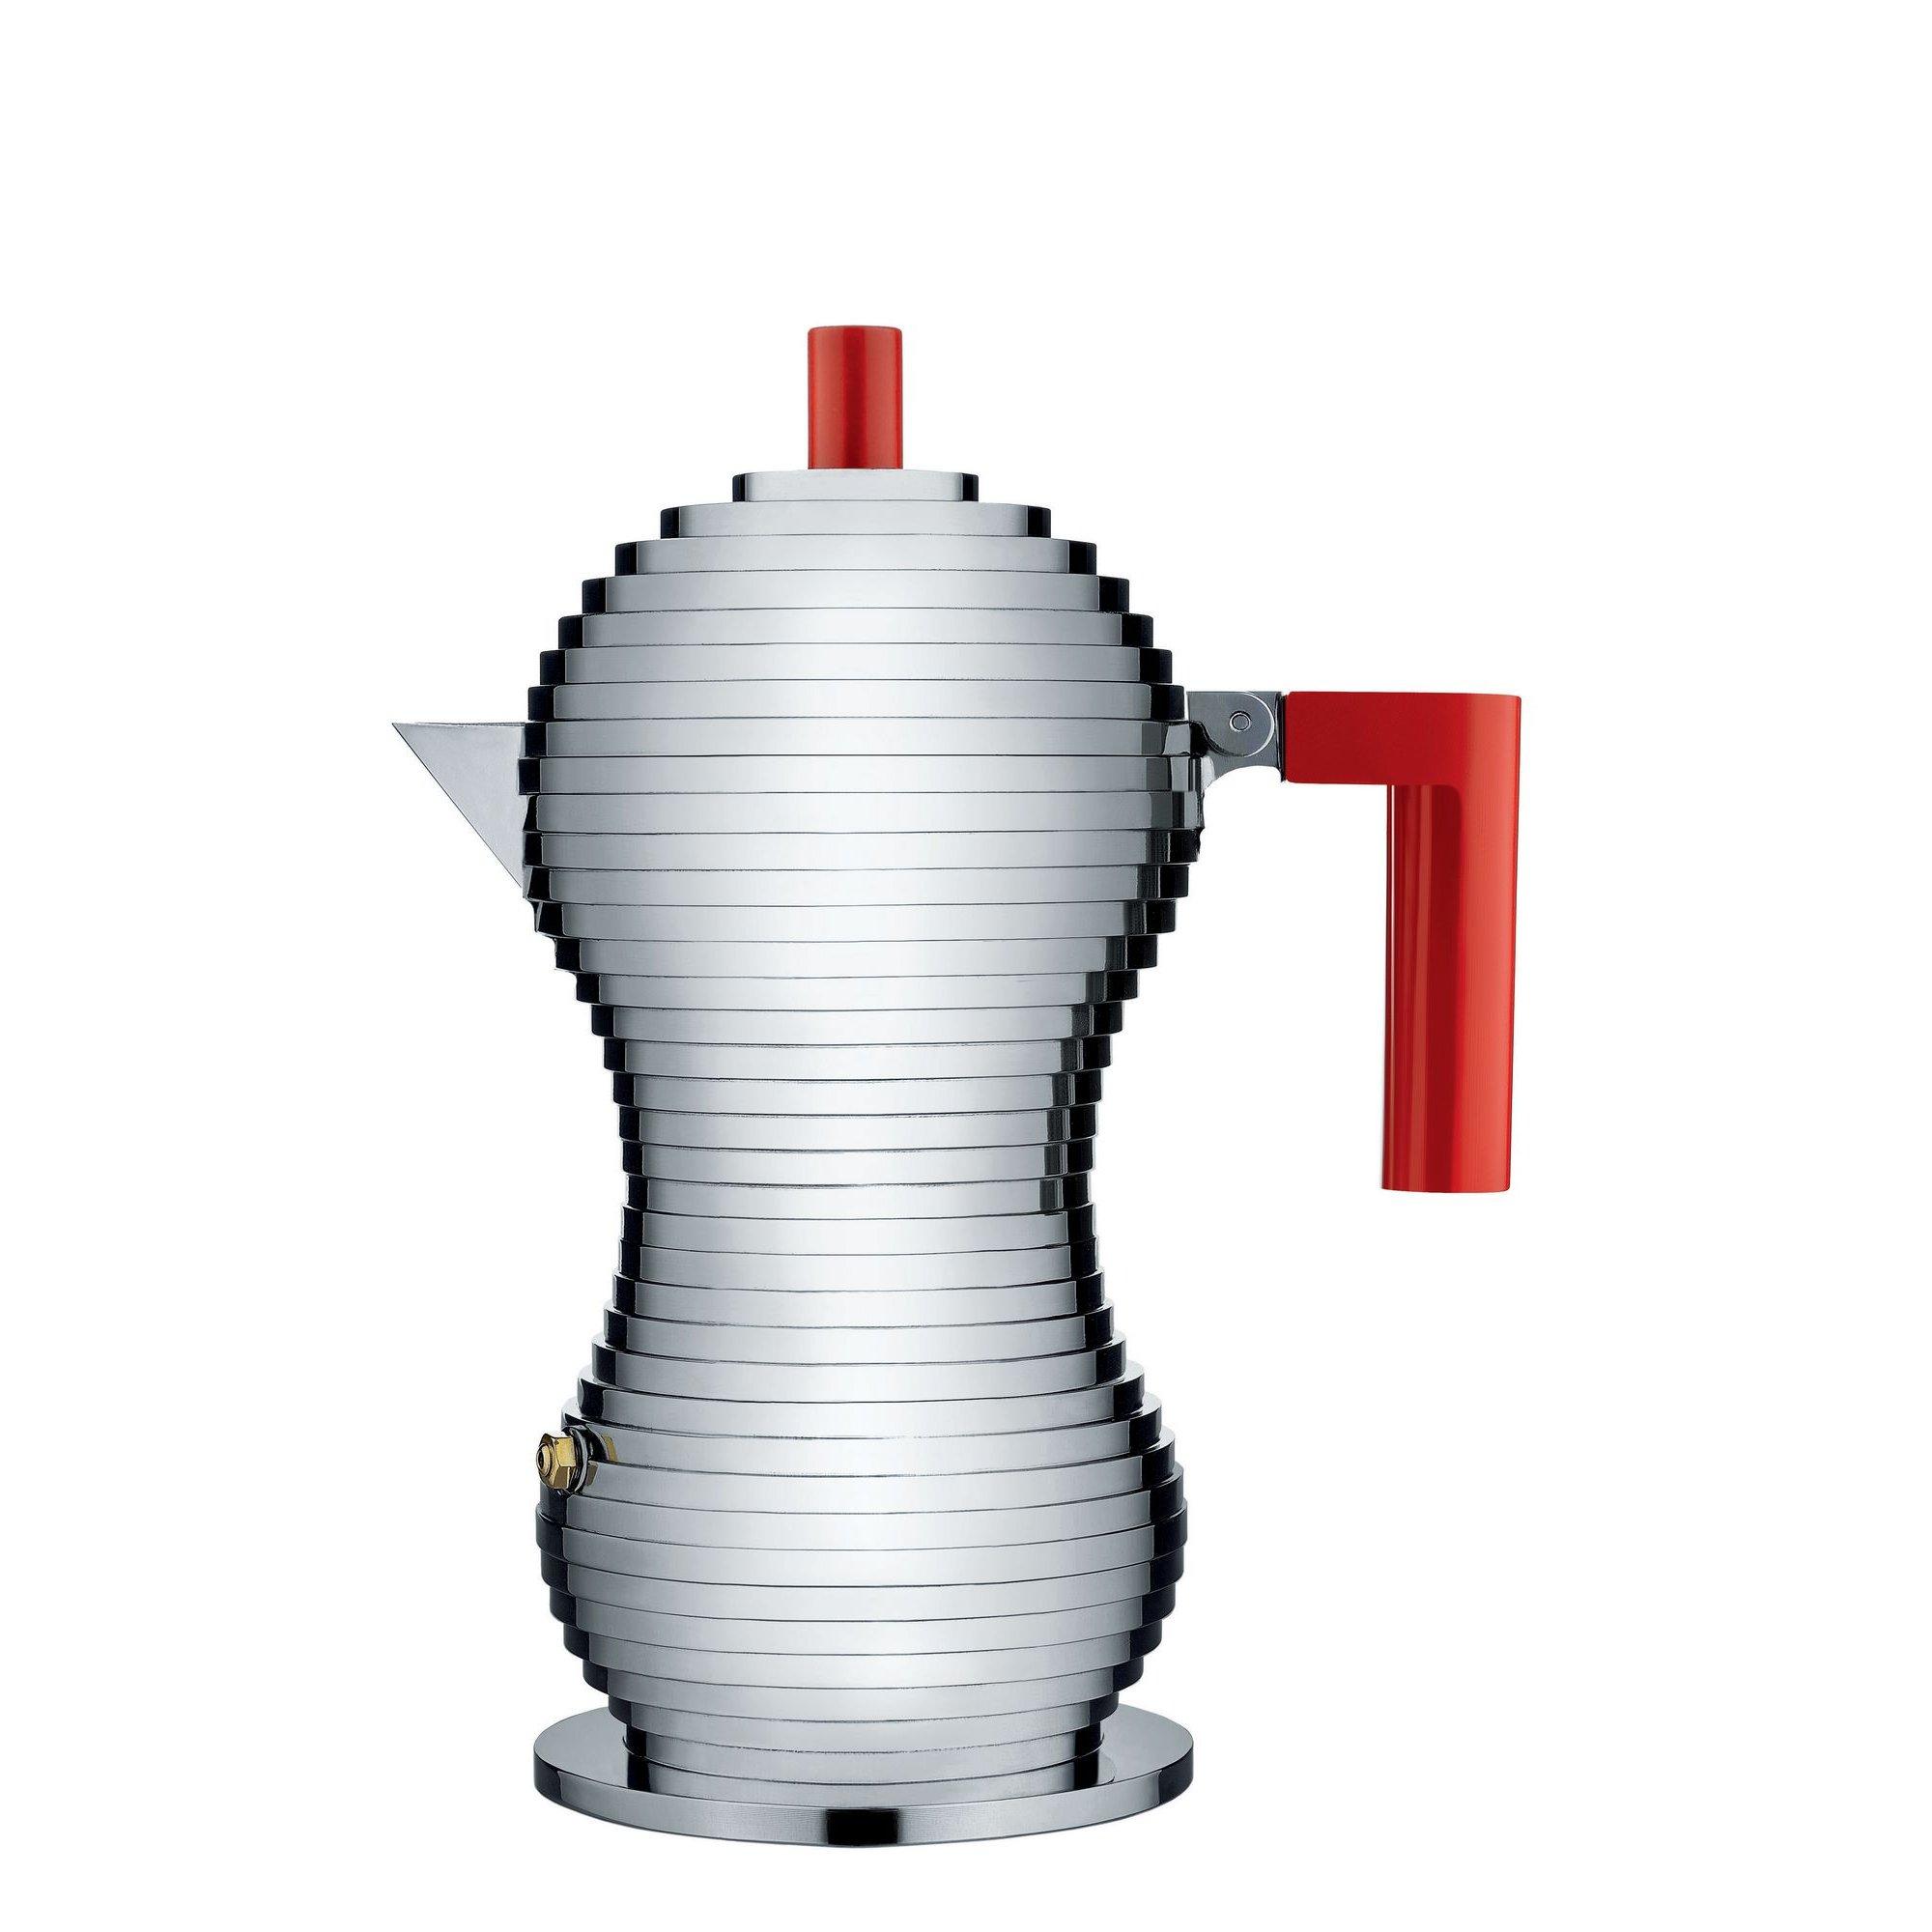 Alessi Percolator MDL02/3 Rood